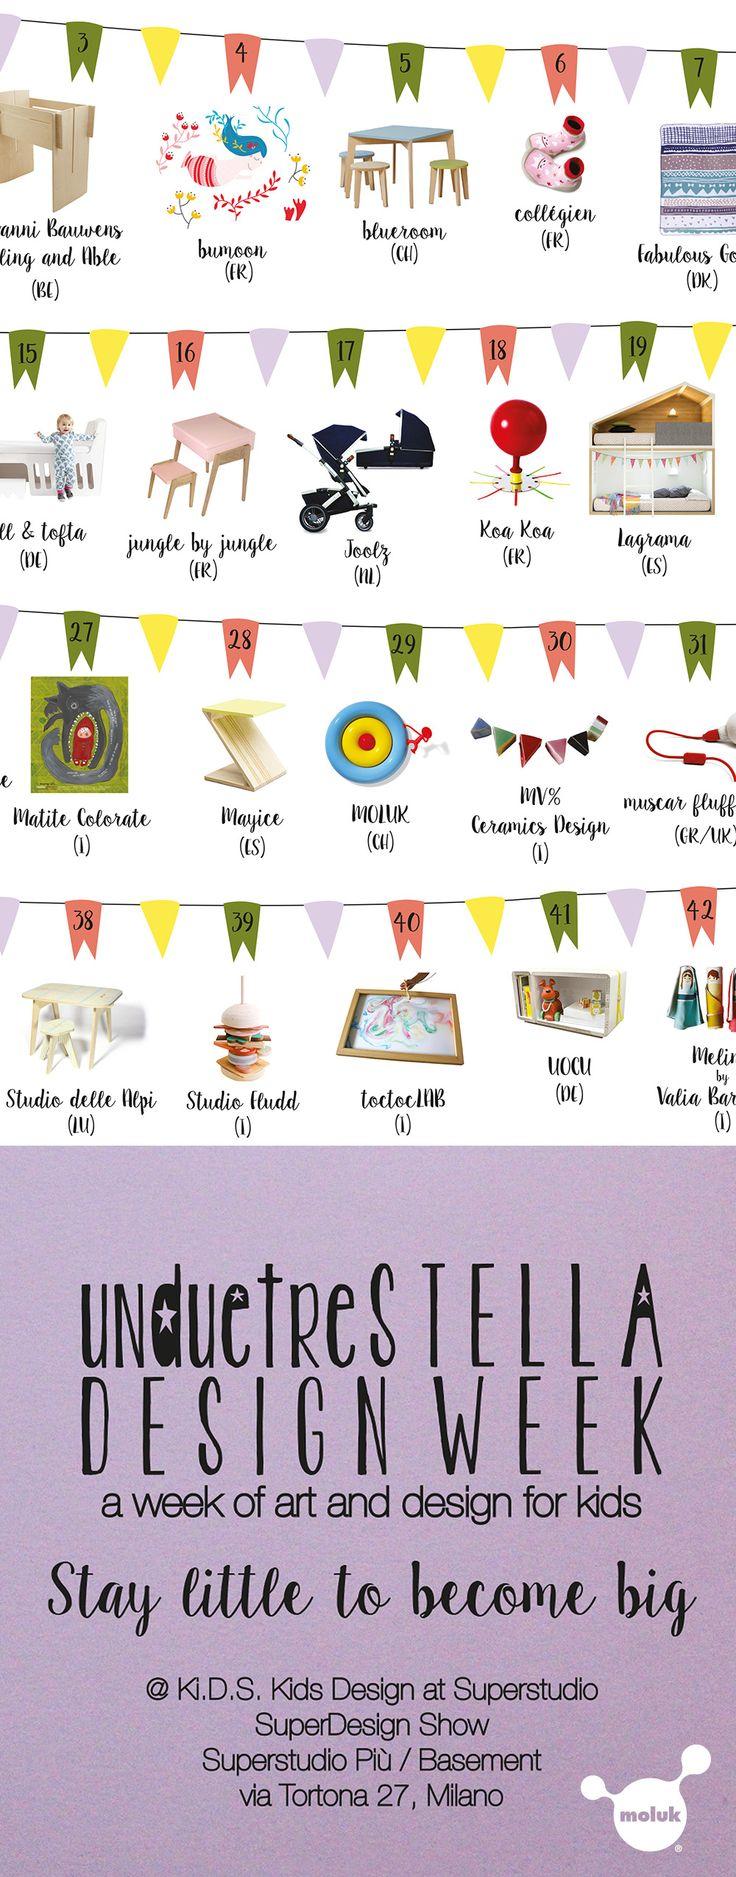 Lil Gaea presenting its creations at unduetrestella DESIGN WEEK @Ki.D.S Kids Design at Superstudio. Superstudio Più / Basement   April 14-19 2015 #staylittle #milandesignweek #fuorisalone